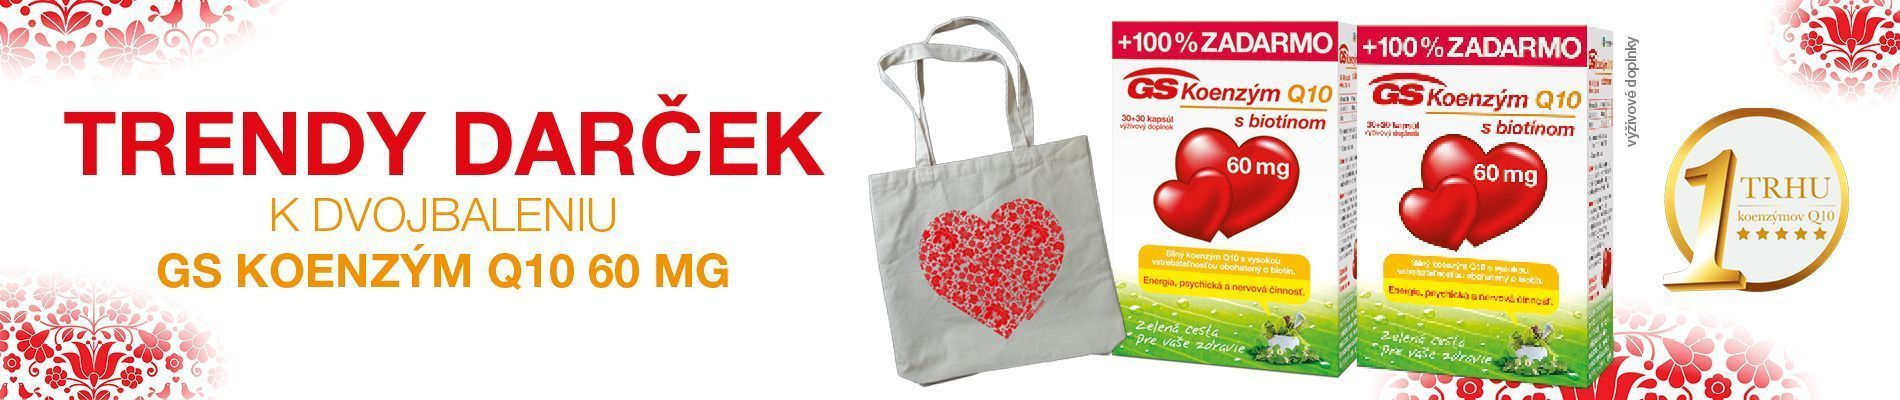 GS Koenzým Q10, 60mg, 2 x 60 kapsúl + darček taška